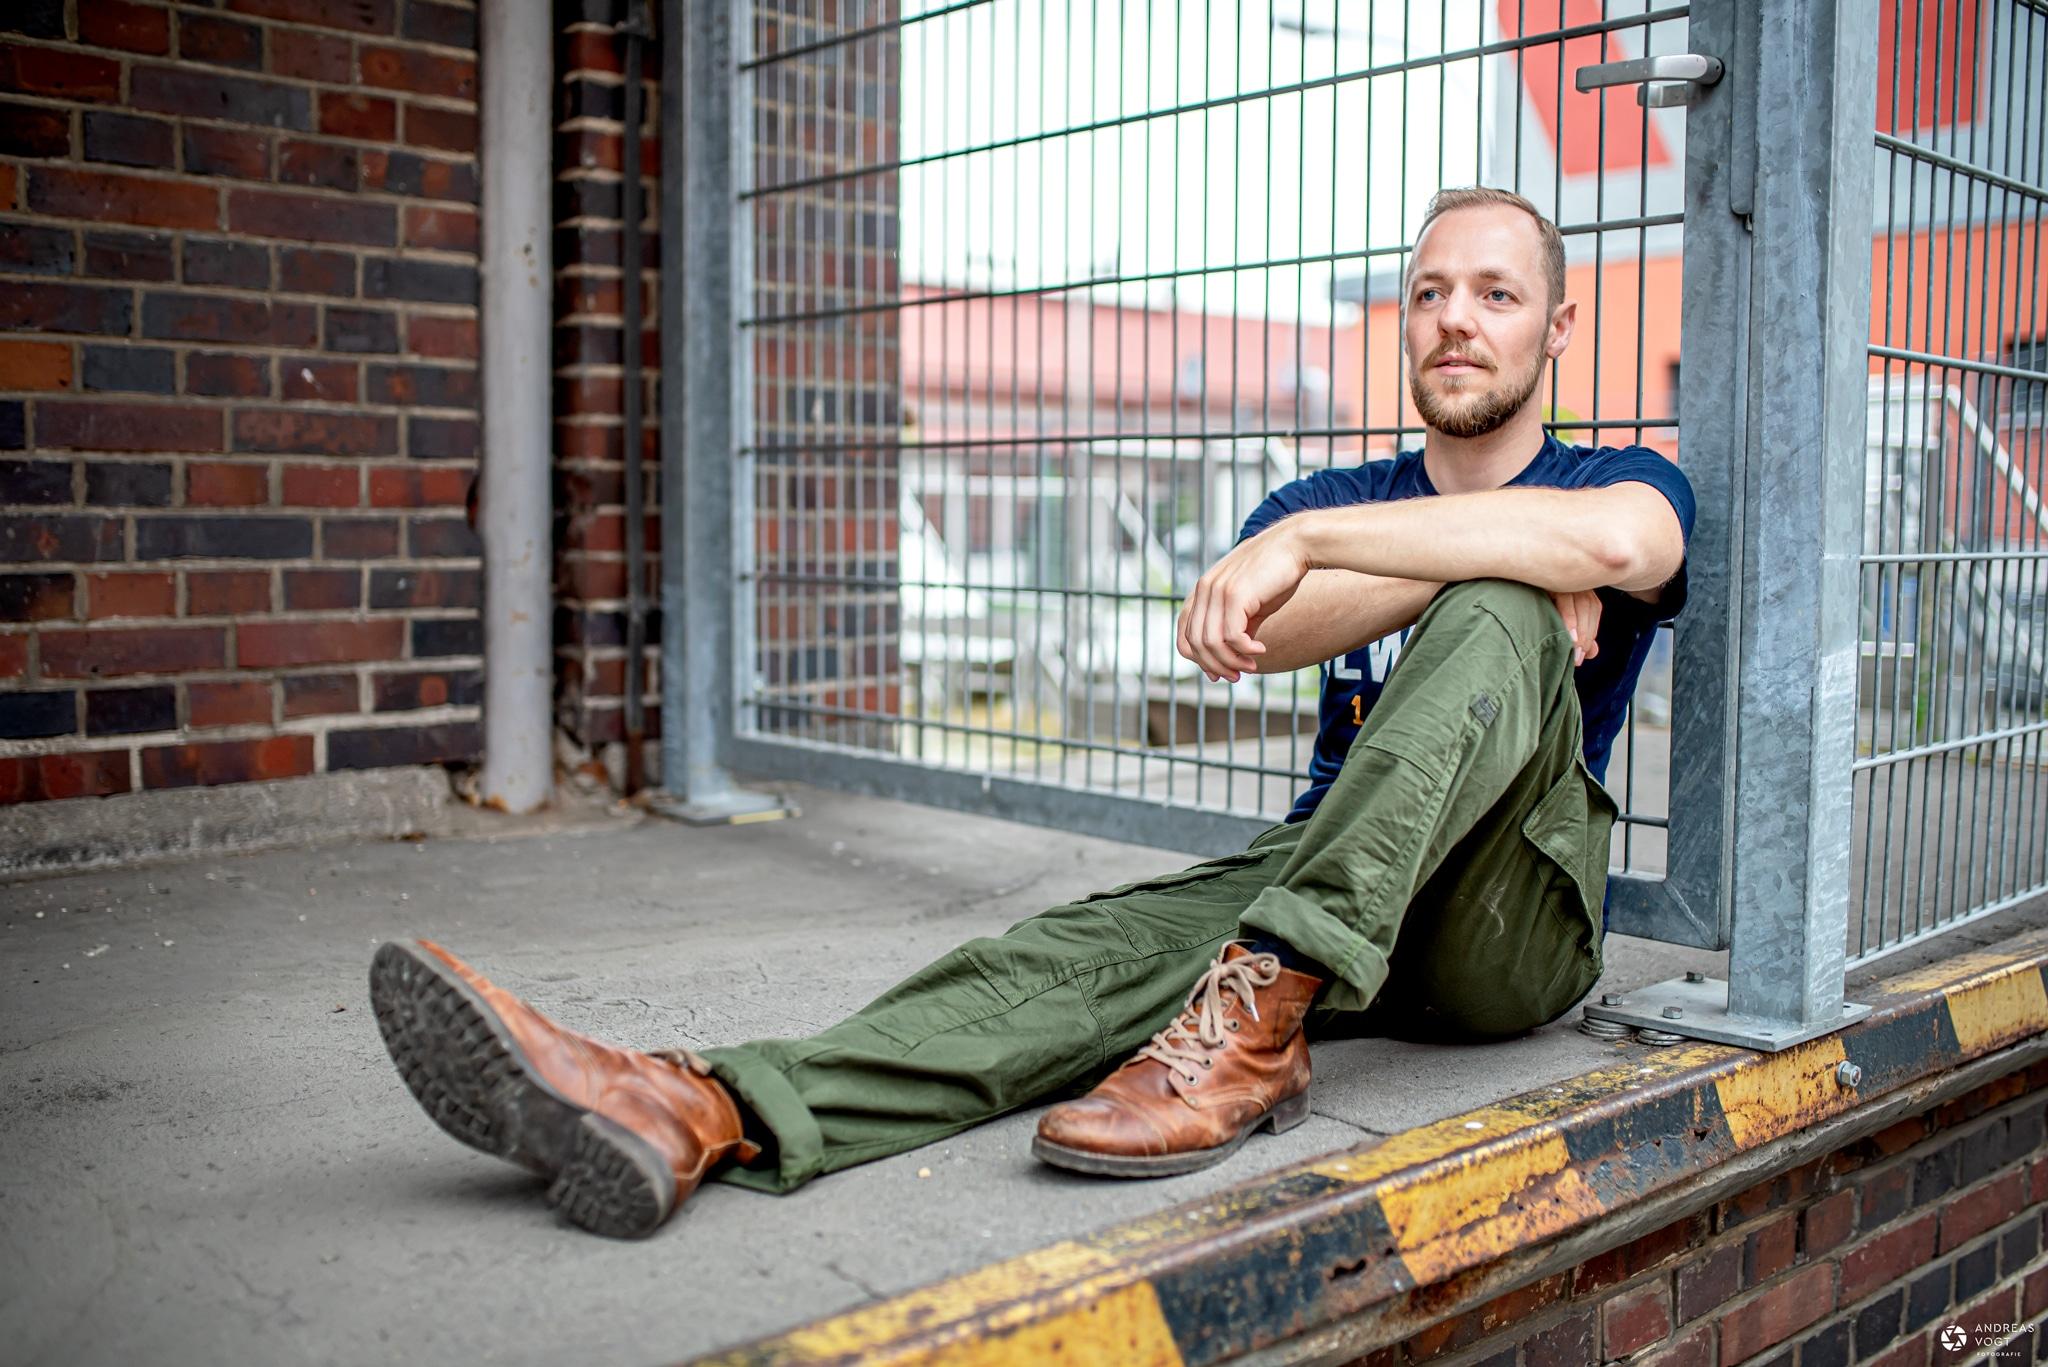 Männerportraits Fotoshooting mit Uwe - Andreas Vogt Fotograf aus Aalen